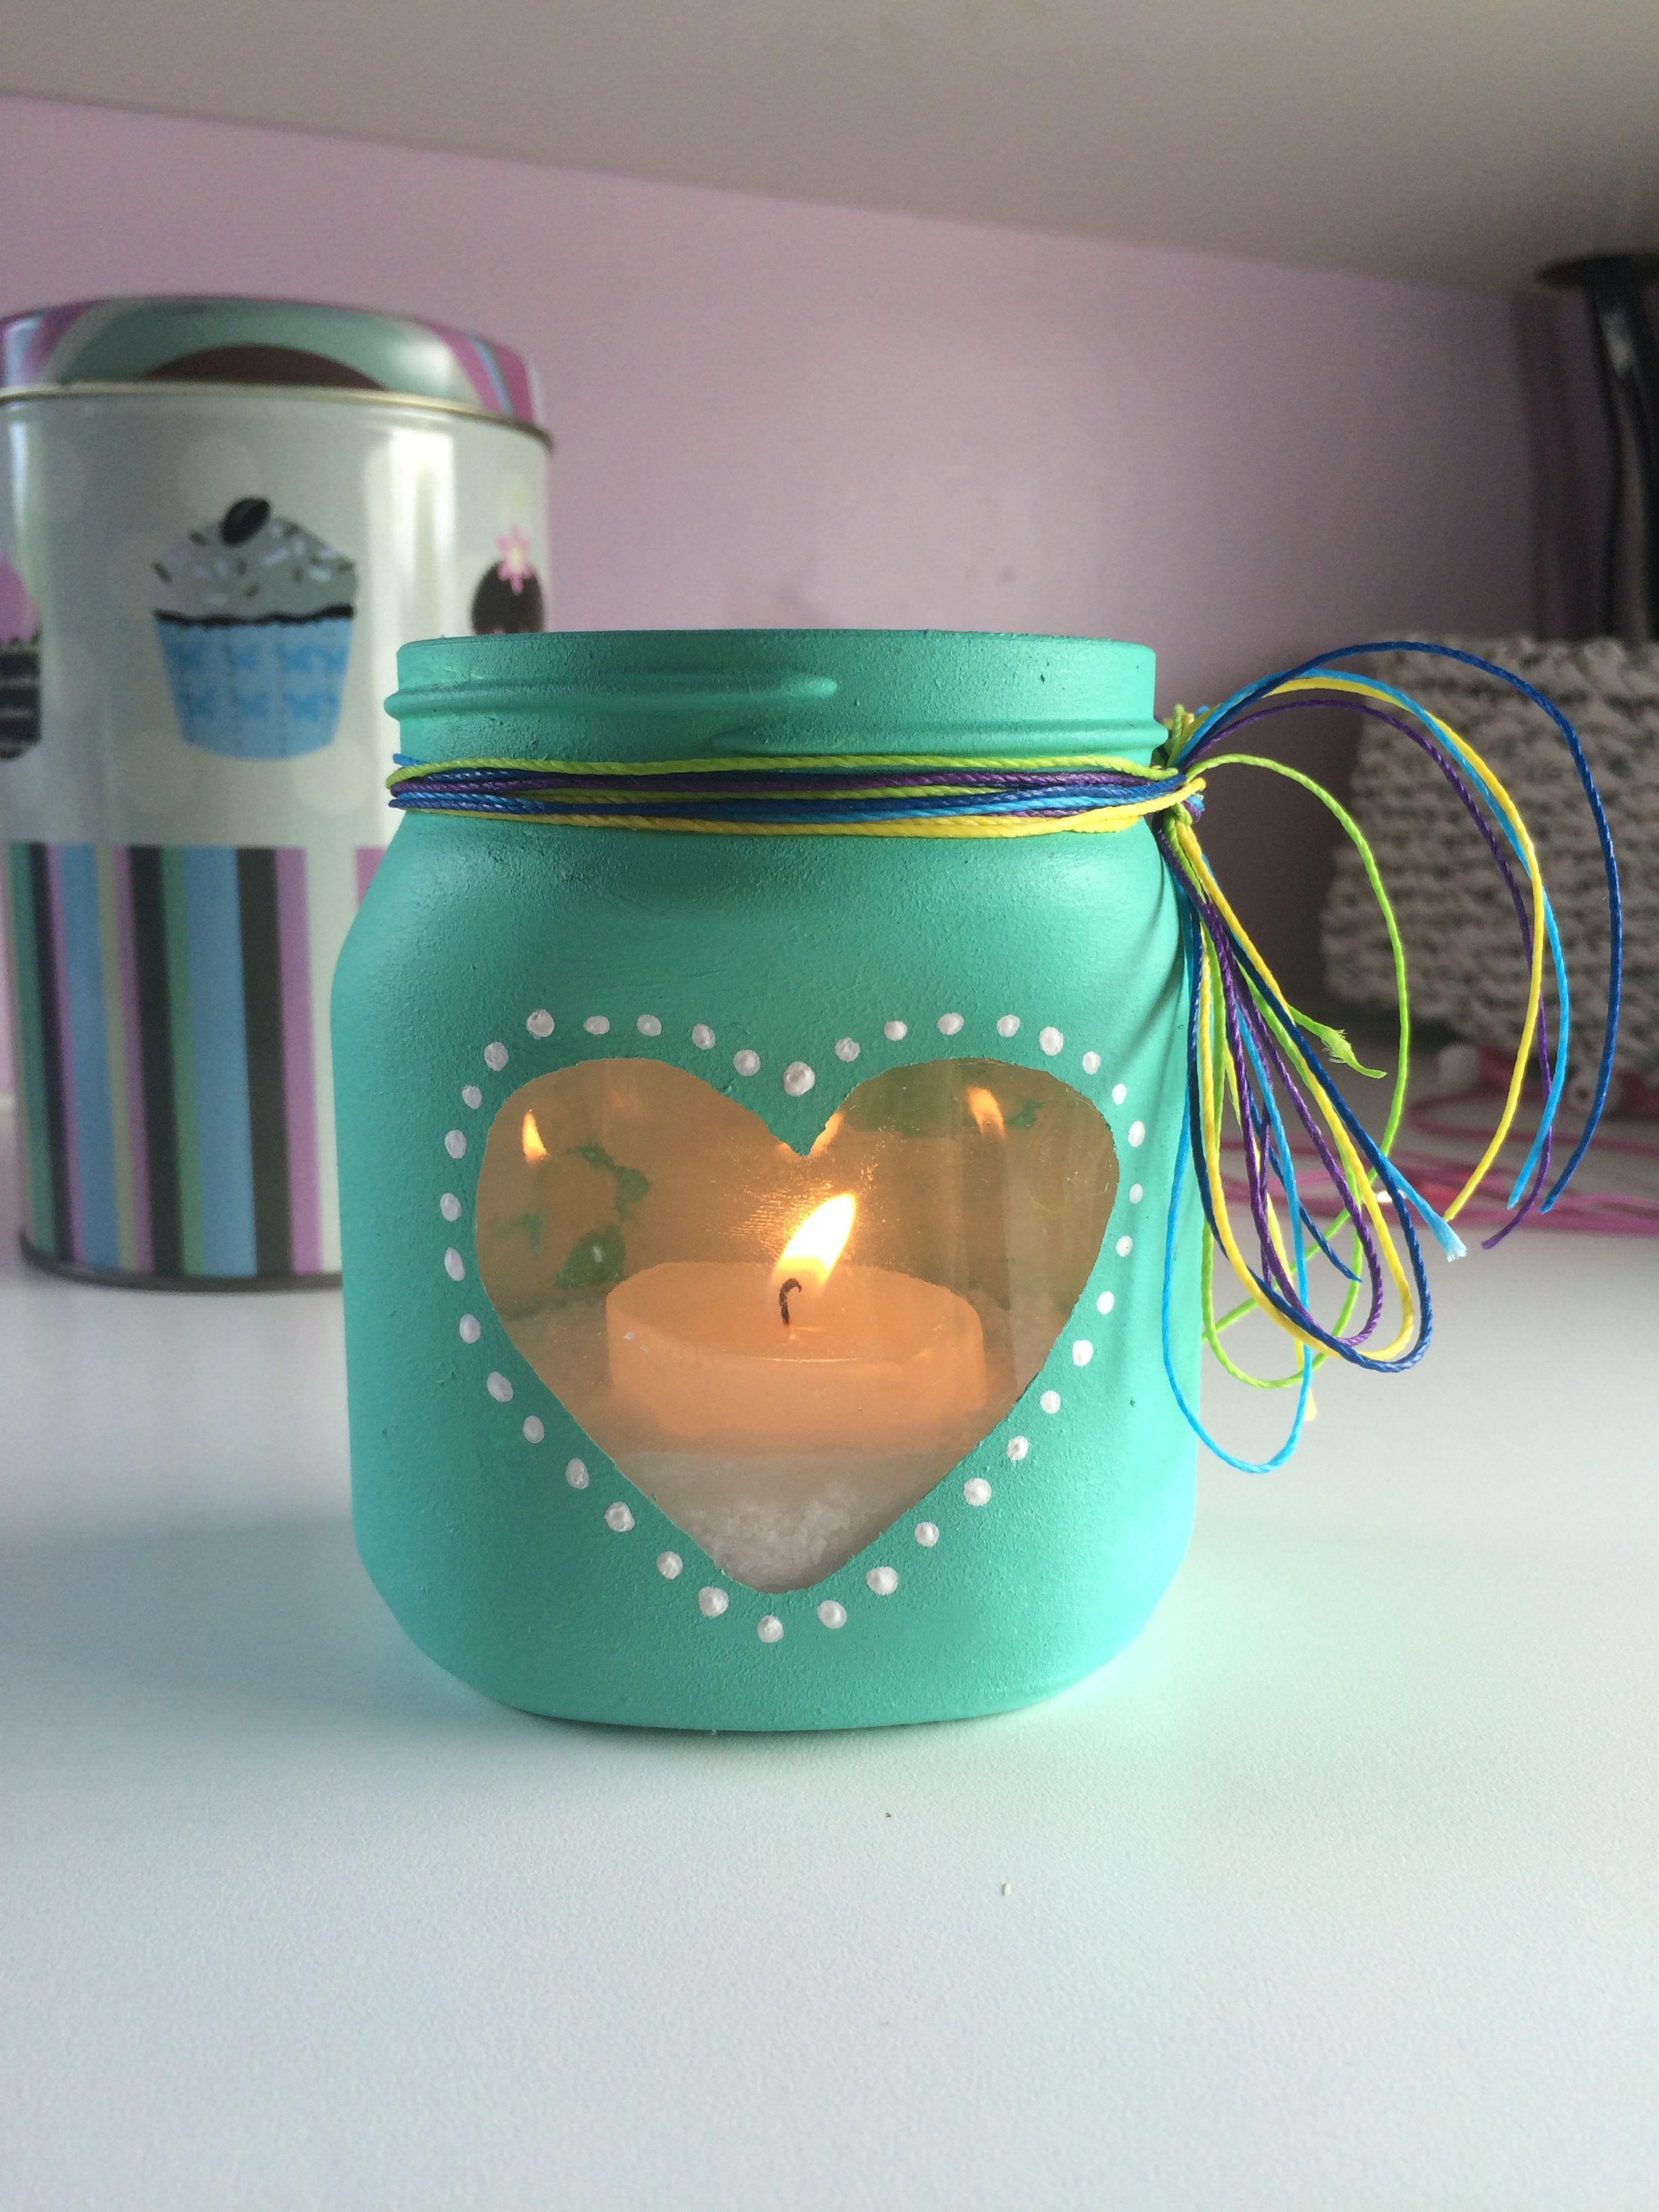 nutella jar transformed diy easy candle basteln pinterest weihnachtsbasar aus alt mach. Black Bedroom Furniture Sets. Home Design Ideas